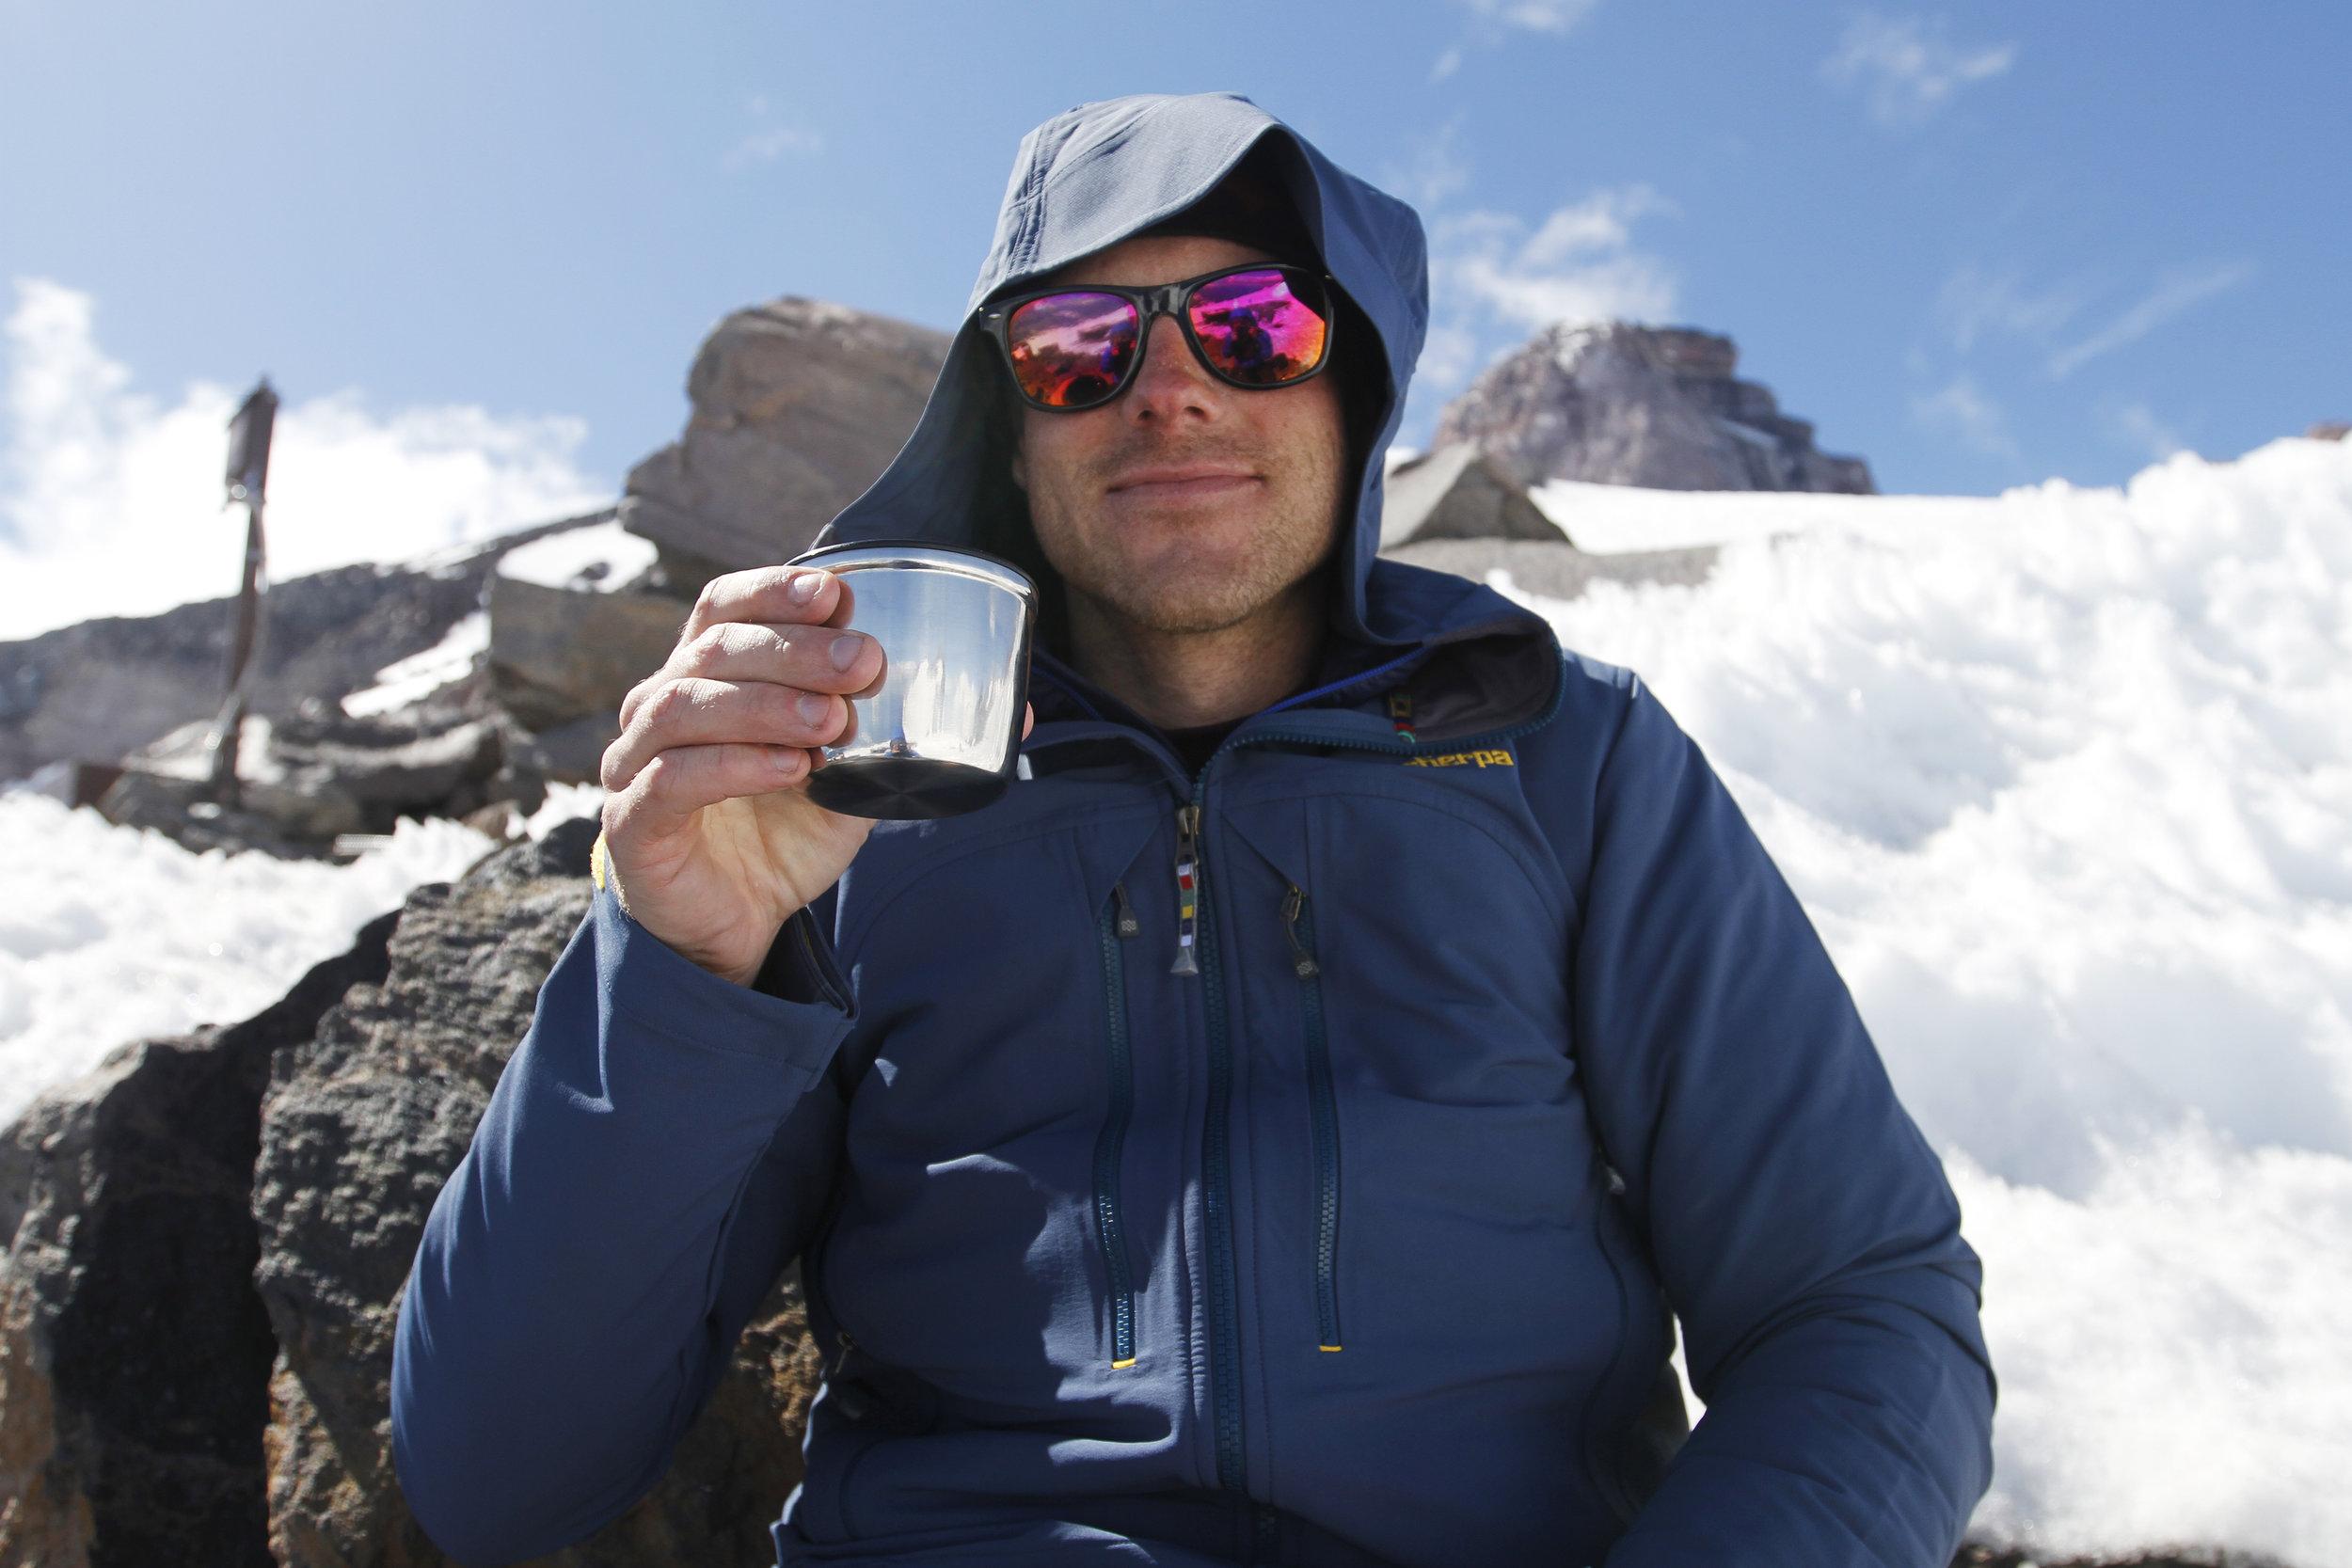 Tea time at 10,188 feet.